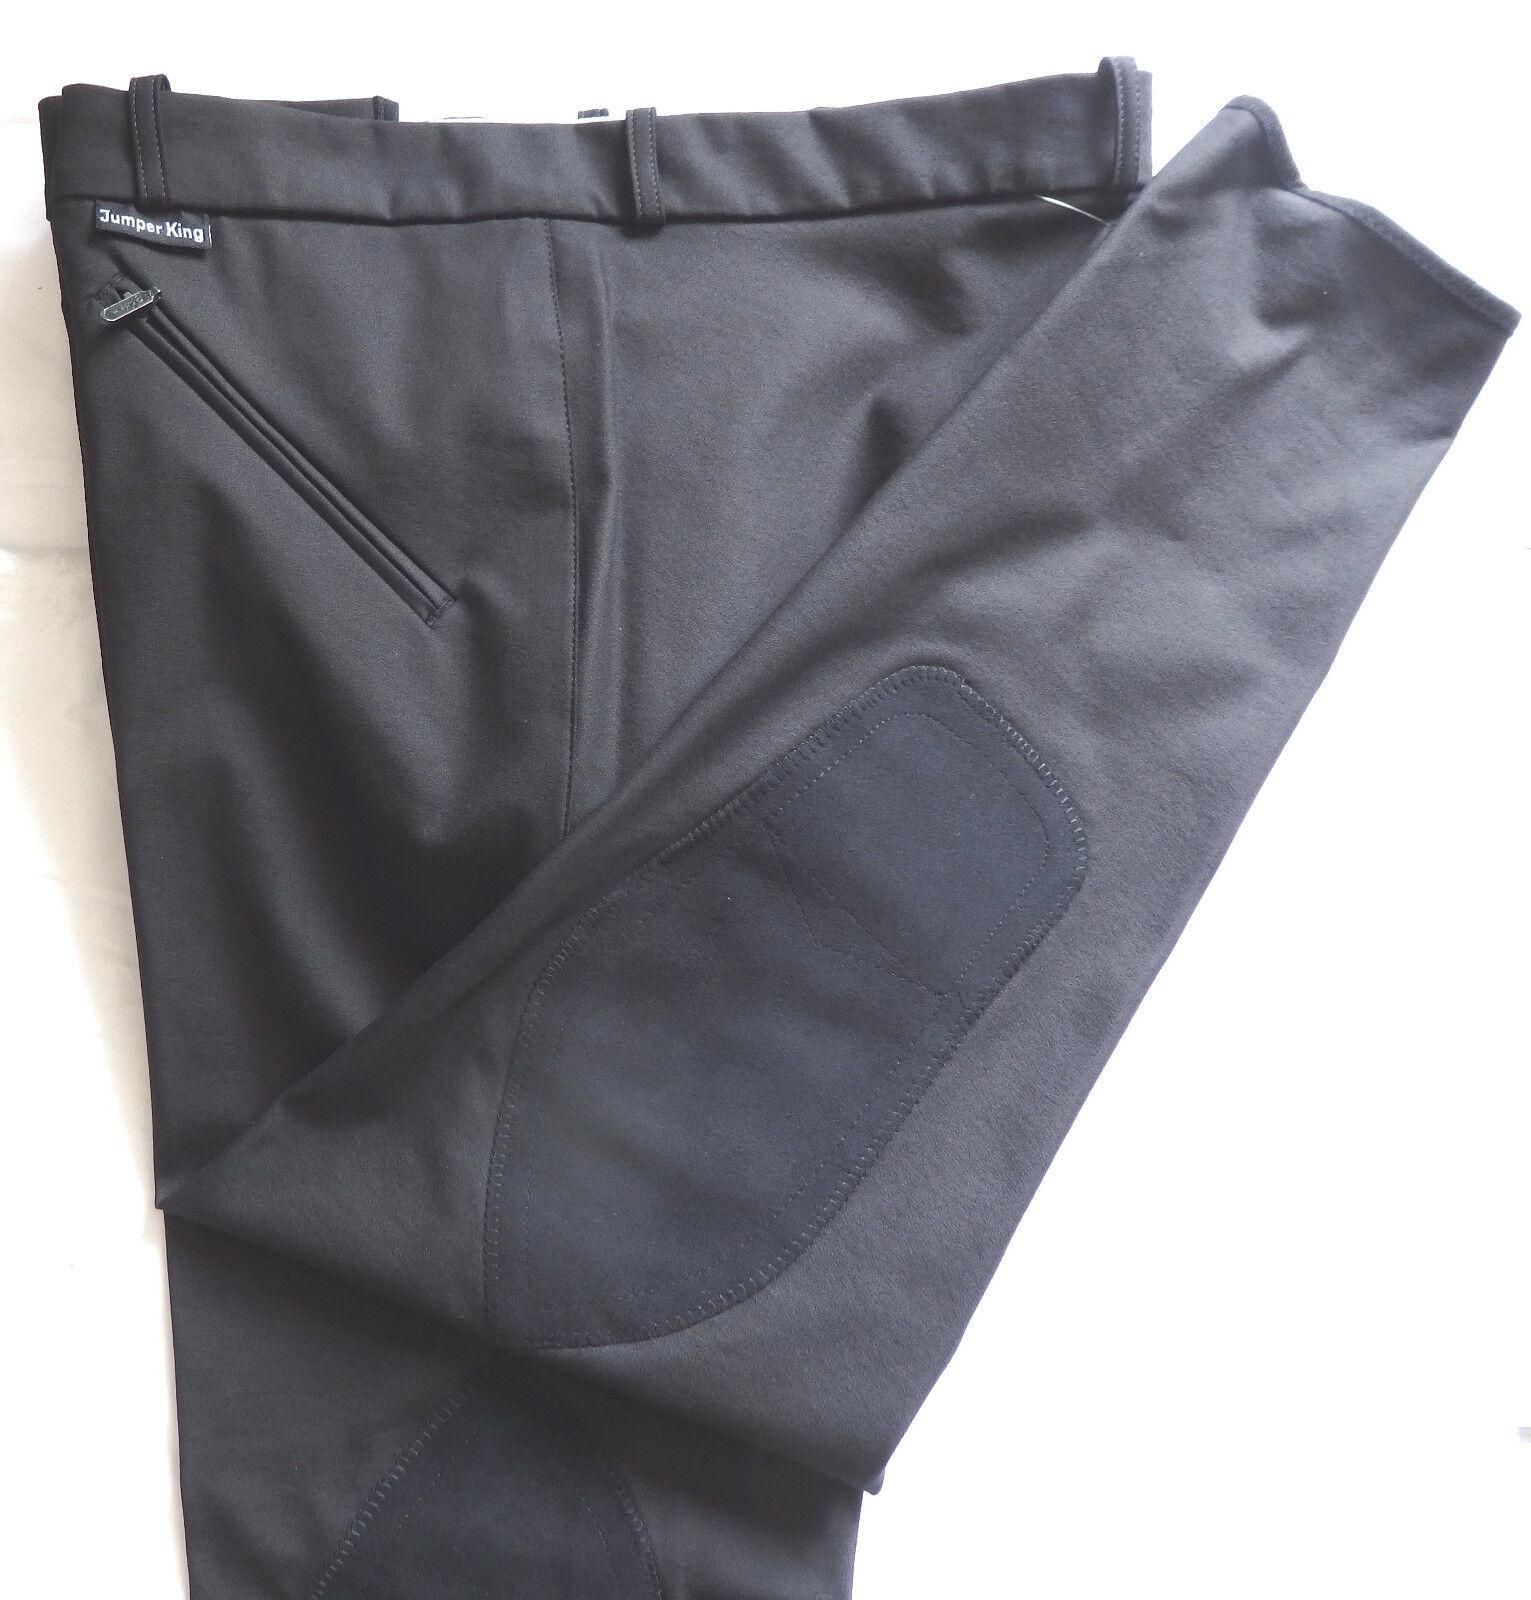 Jumper King señores reithose, rodilla ribete, negro, talla  27, (d500)  saludable